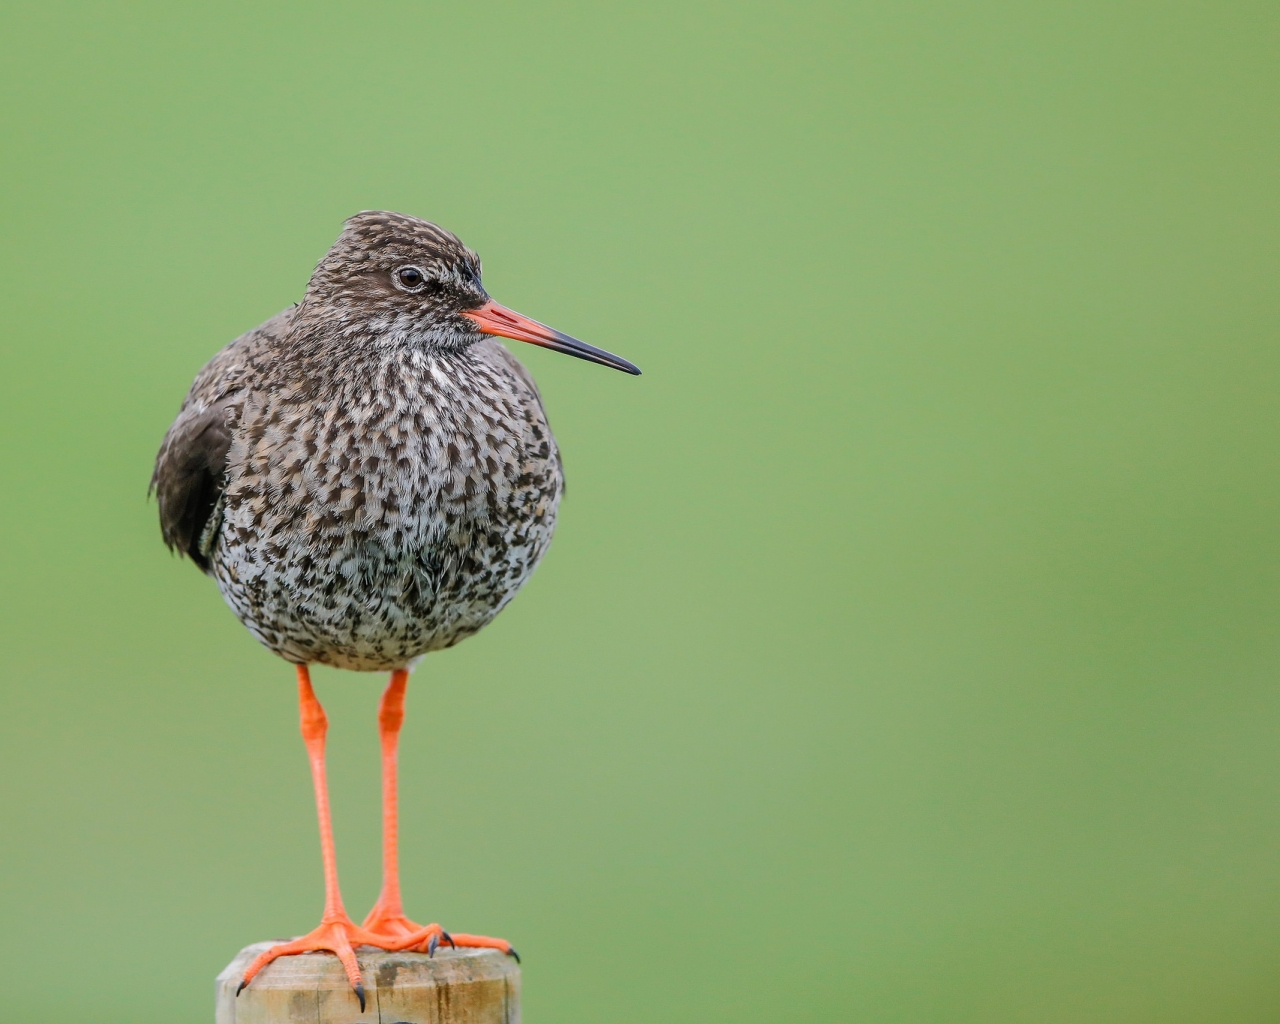 Aves hermosas - 1280x1024